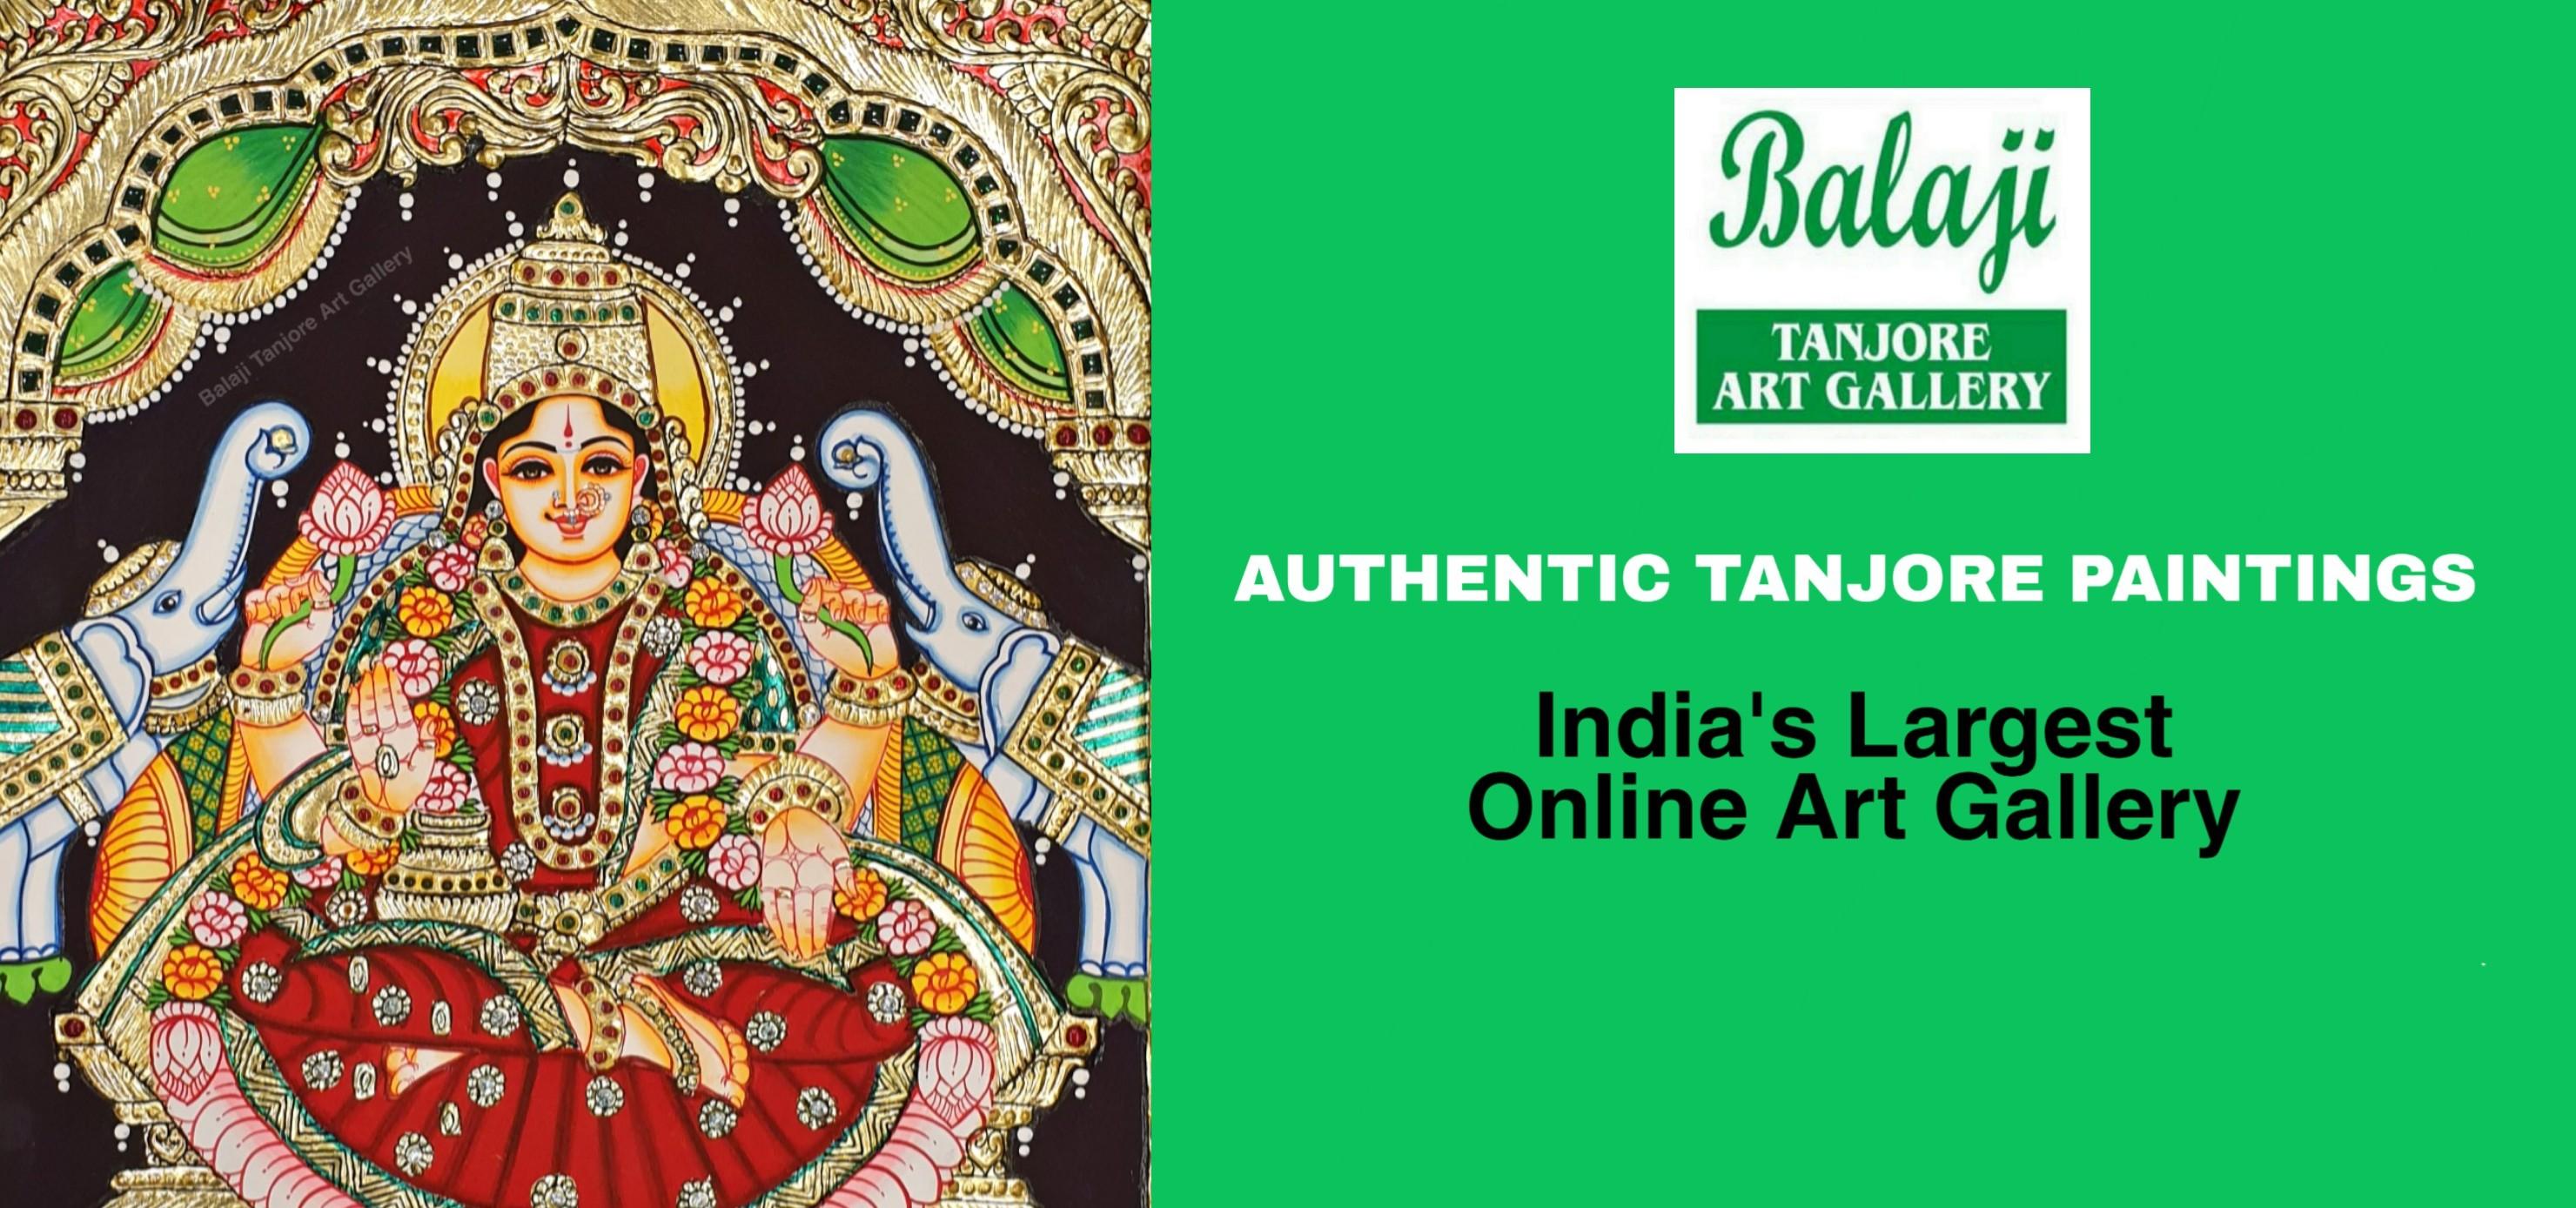 Balaji Art Gallery